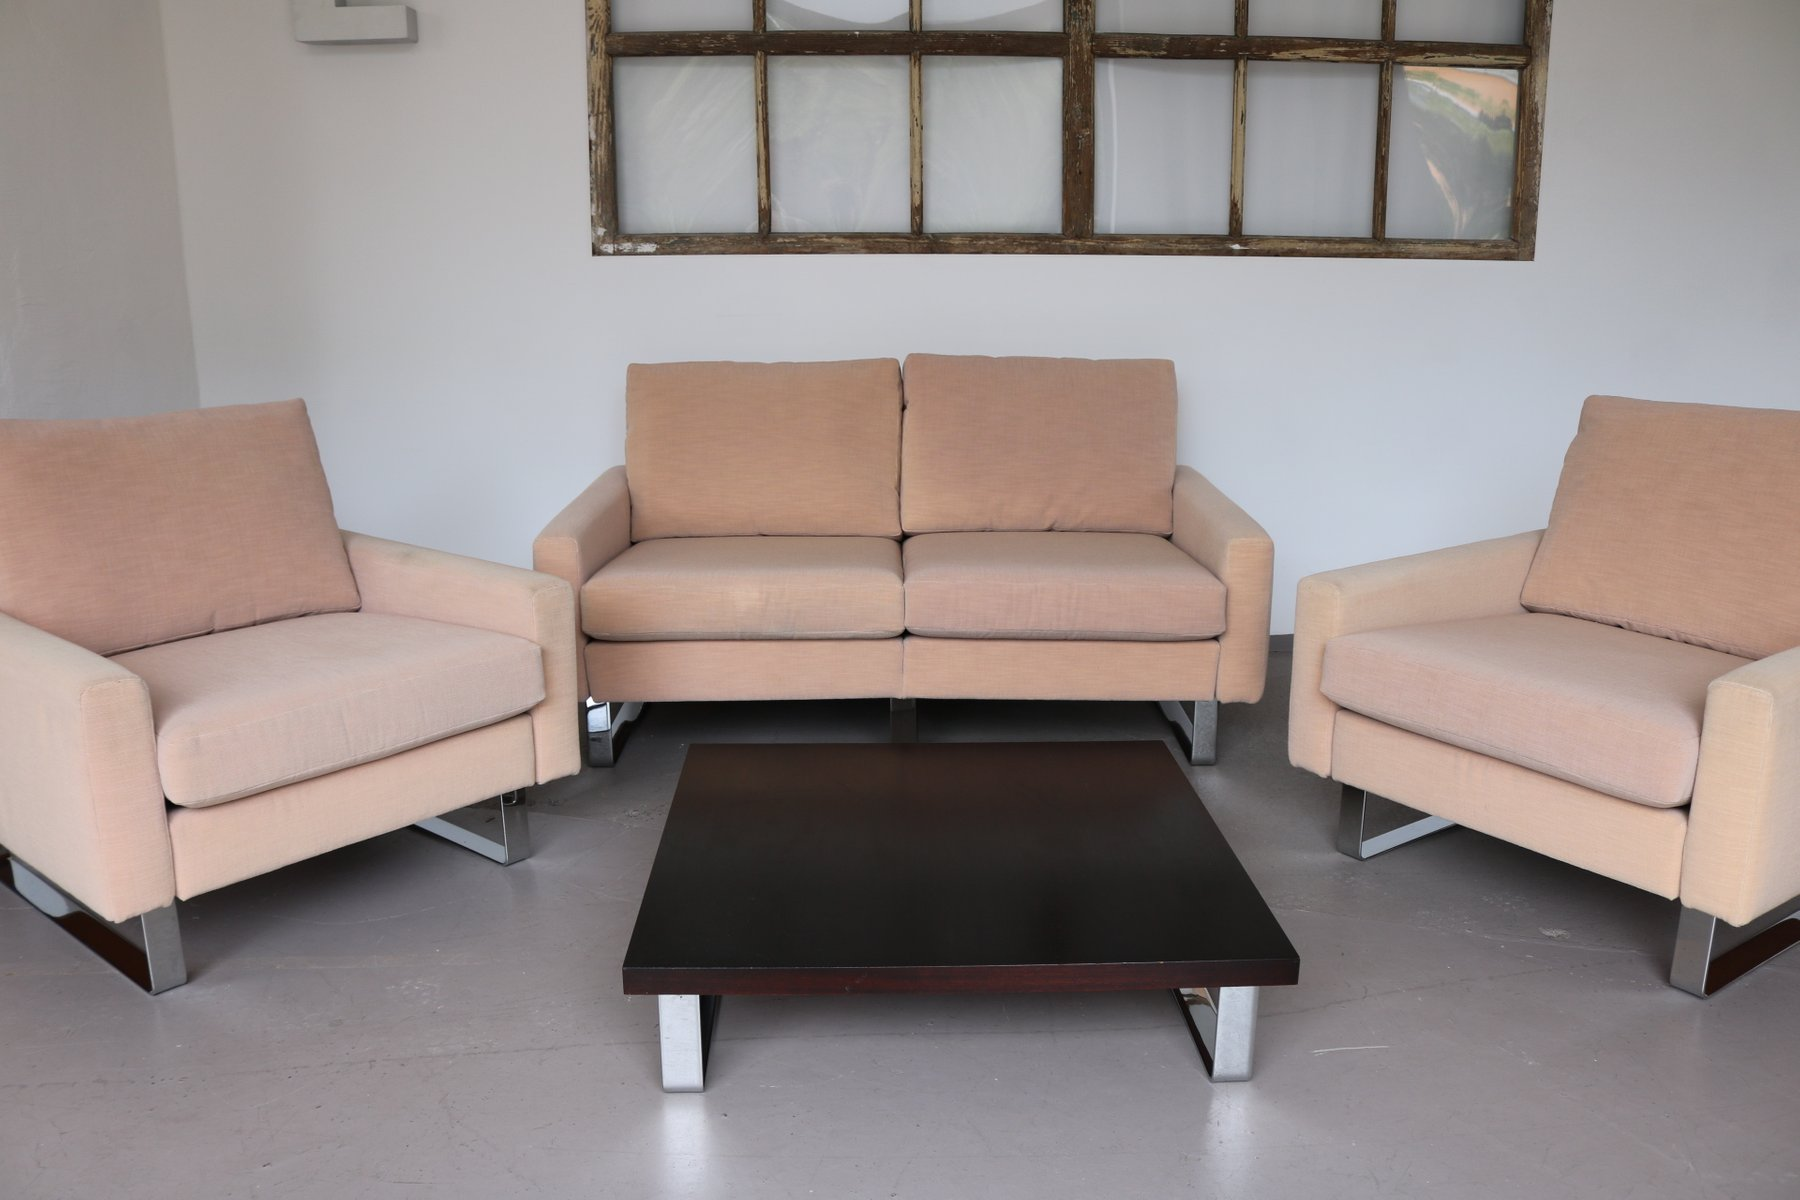 conseta sessel sofa tisch von f w m ller f r cor. Black Bedroom Furniture Sets. Home Design Ideas